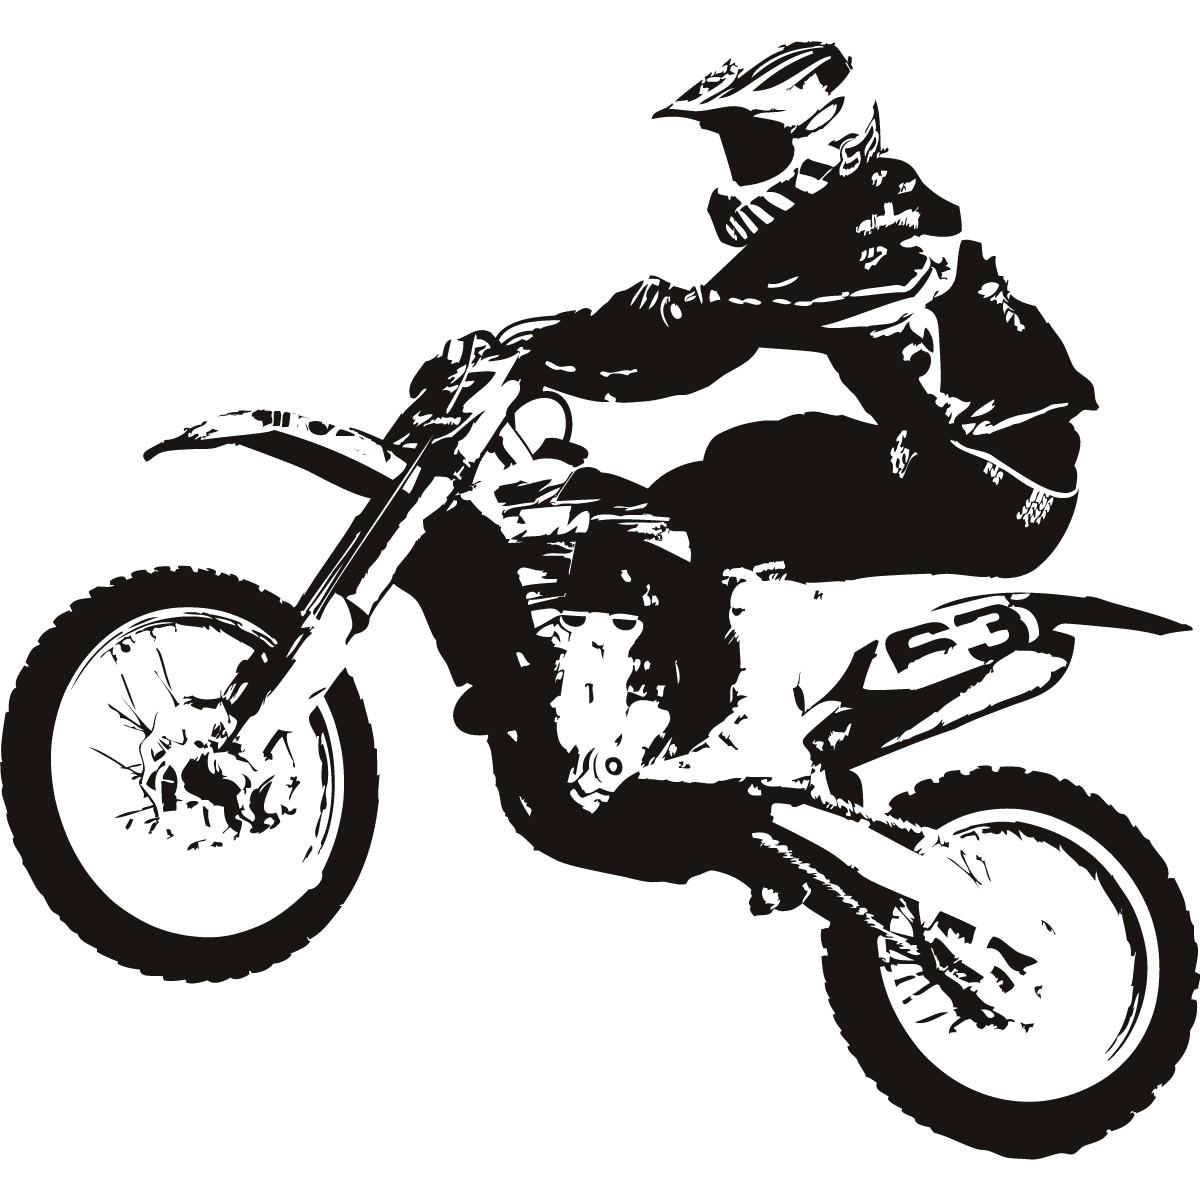 Drawn biker black & white #4